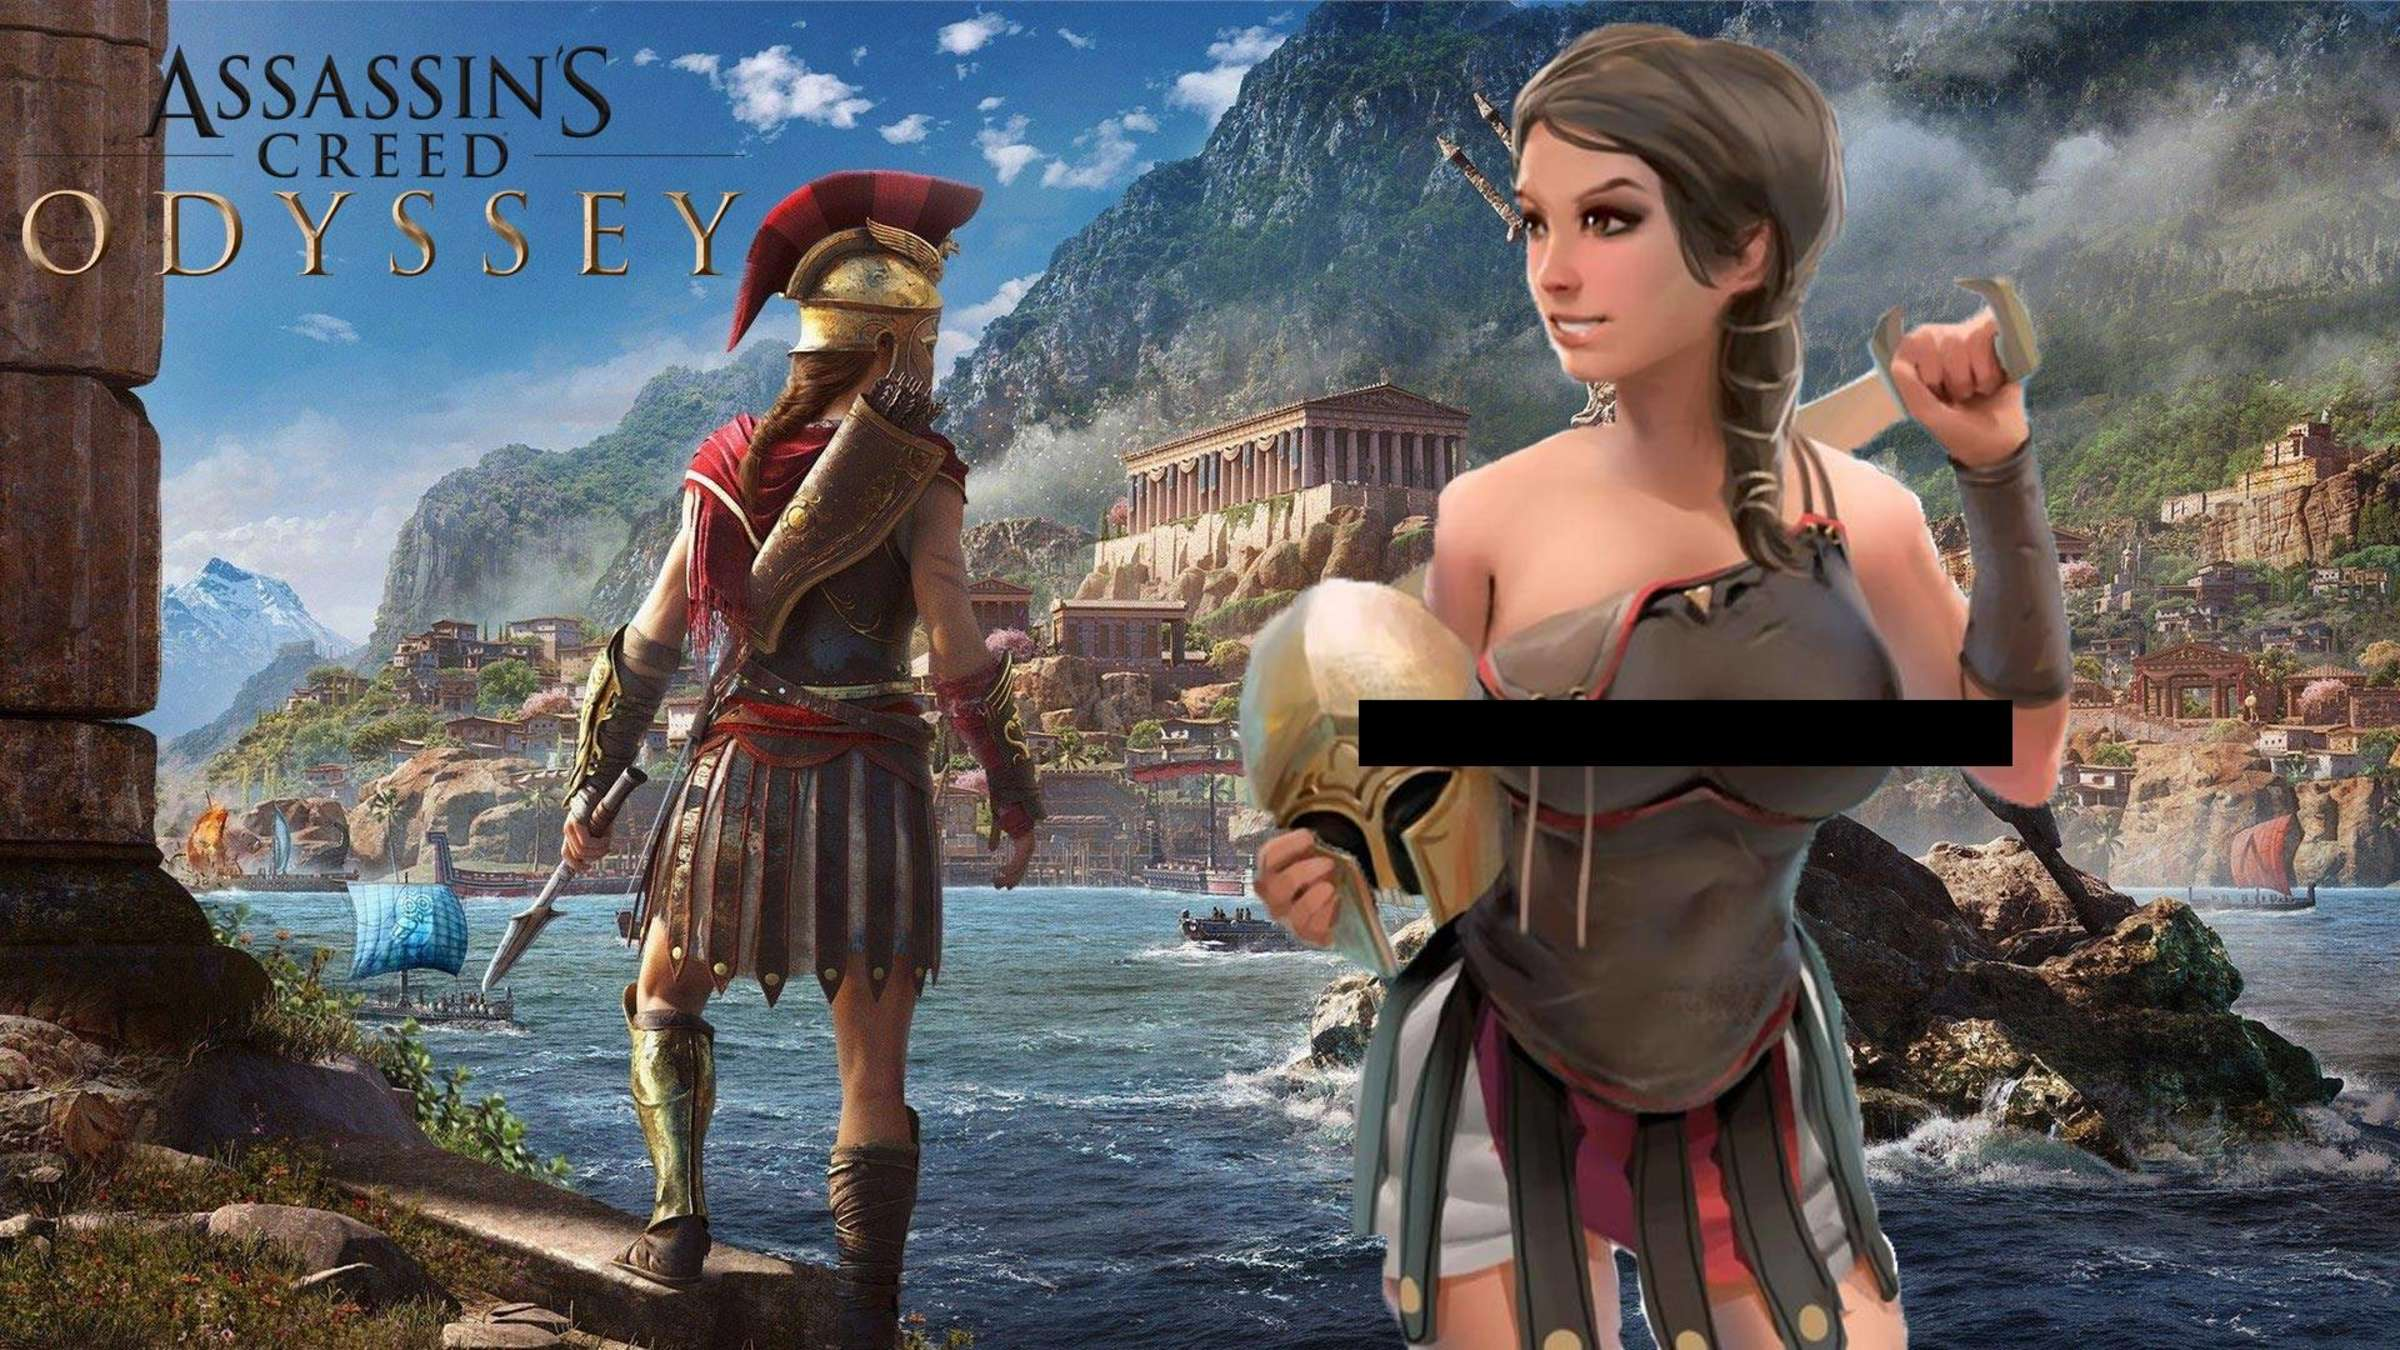 Assassins creed odyssey kassandra nackt